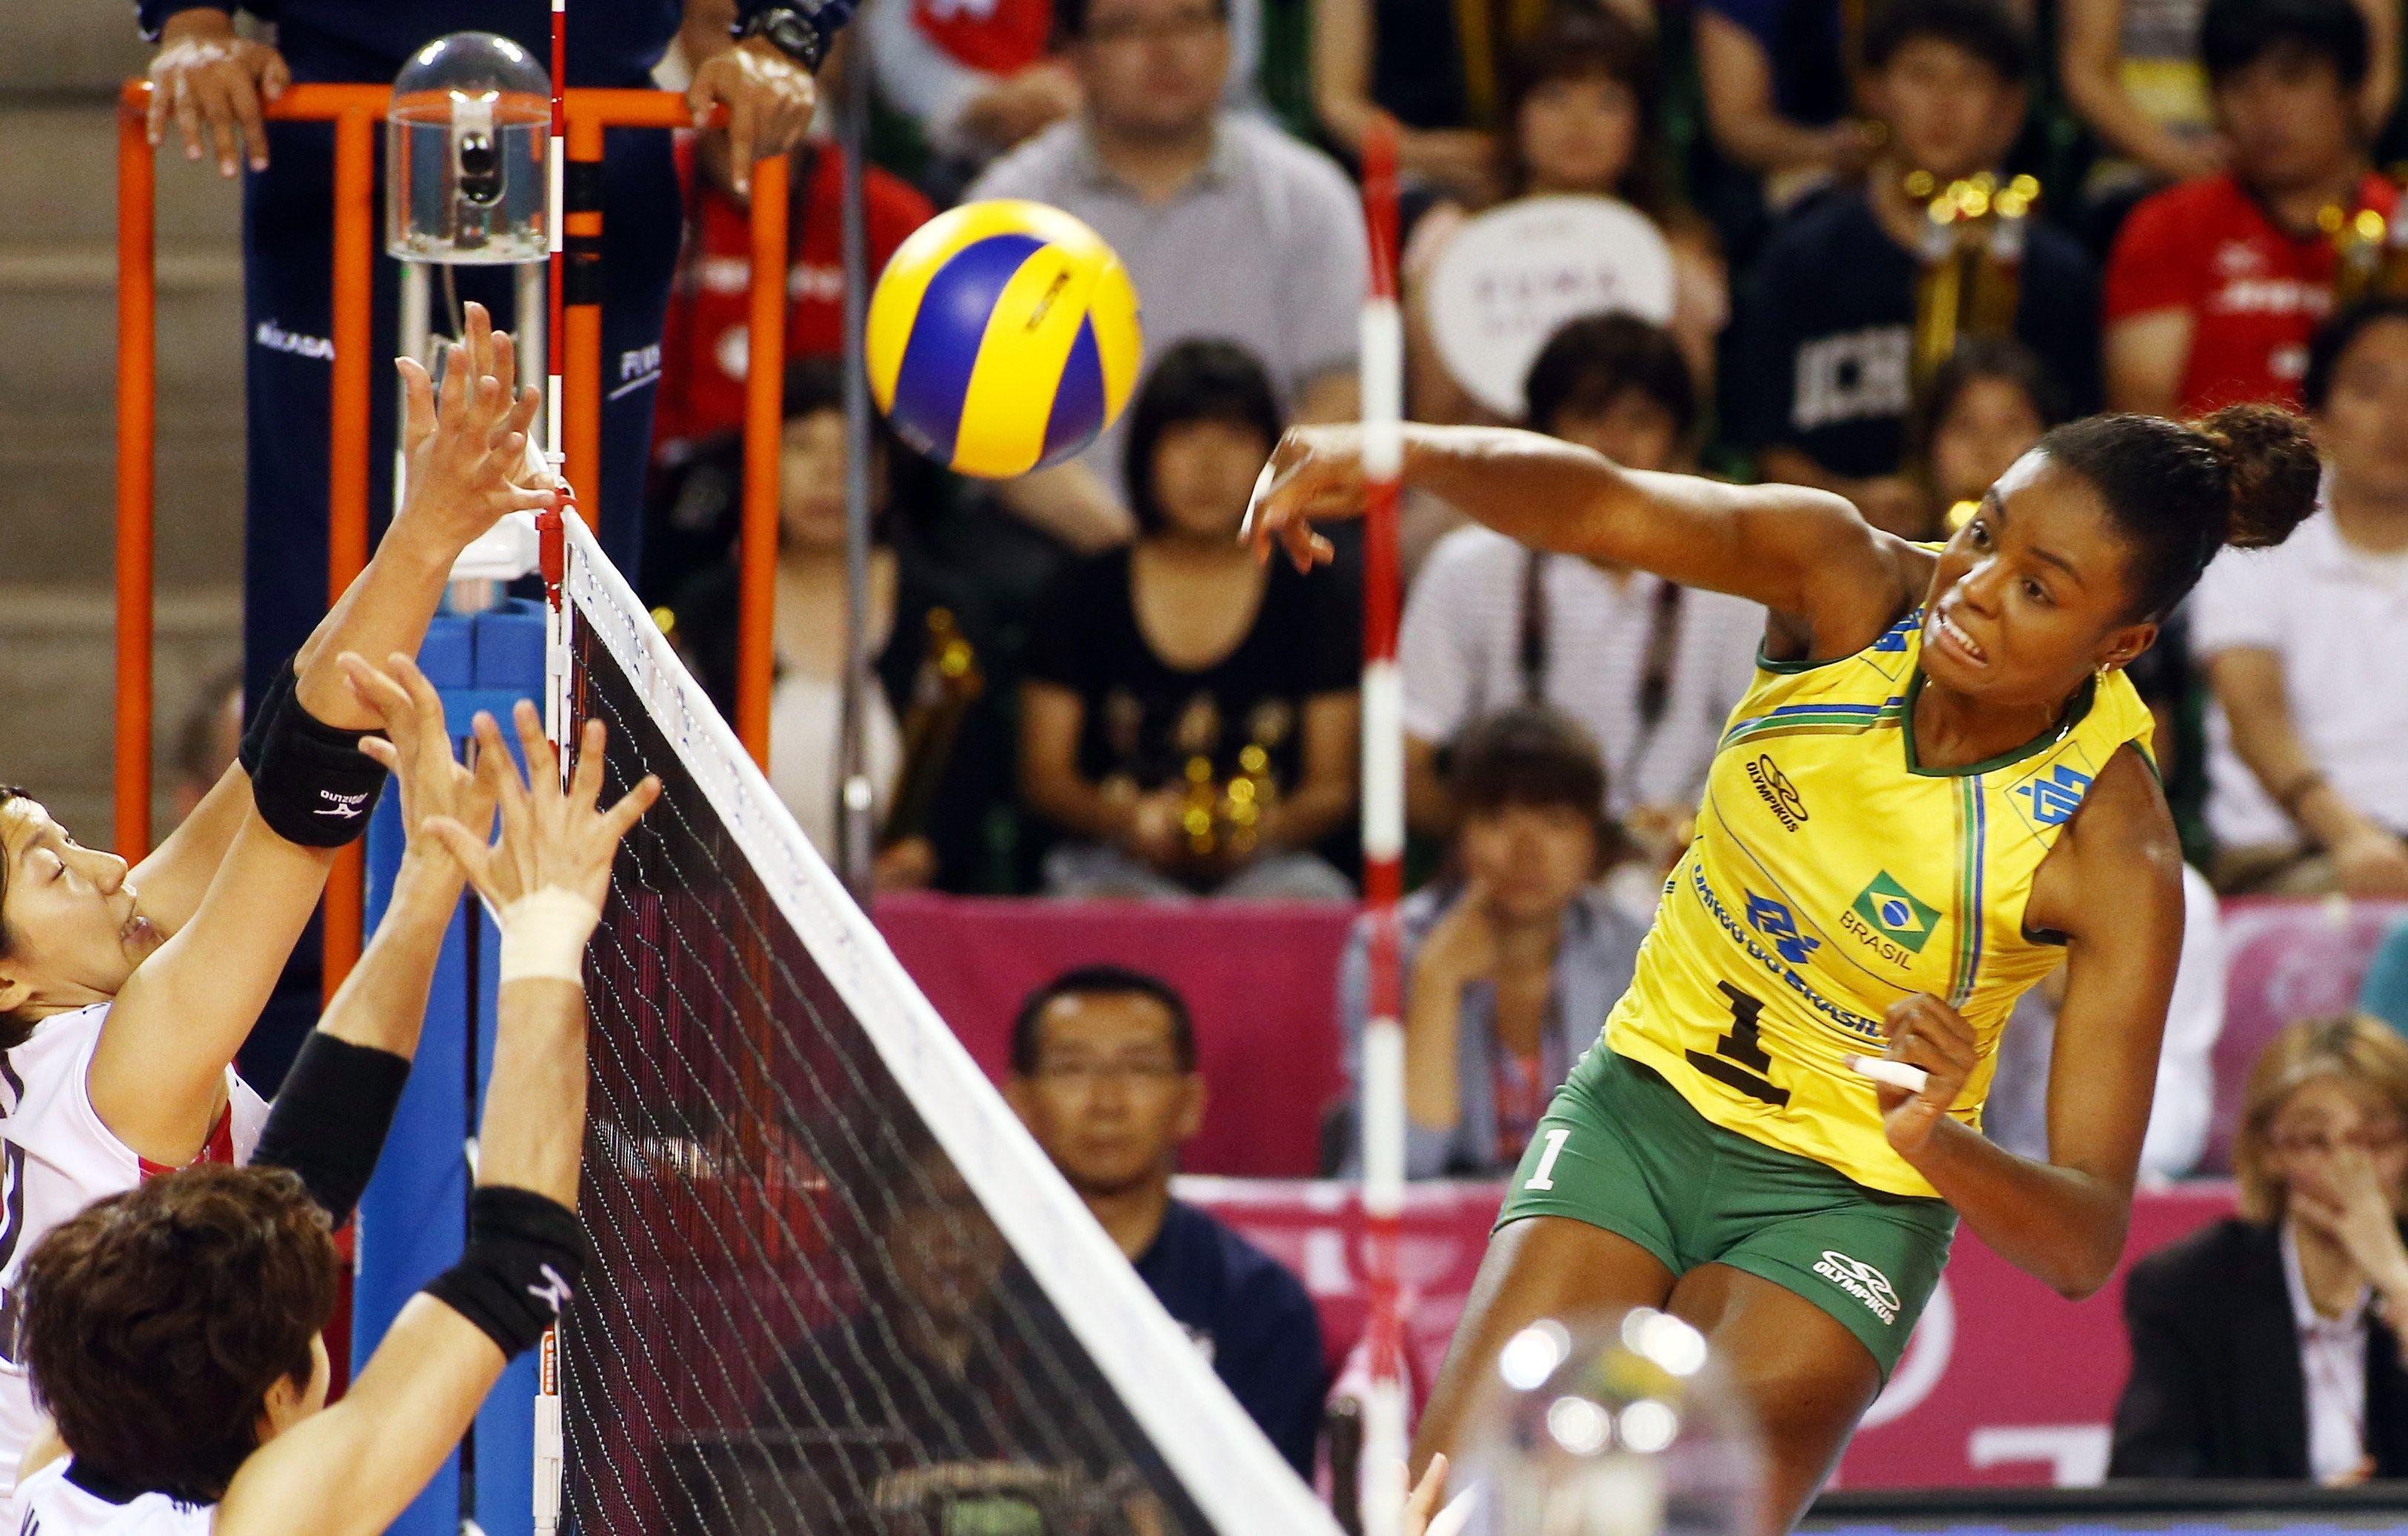 Brazil S Claudino Fabiana Atacking Beach Volleyball Basketball Court Brazil